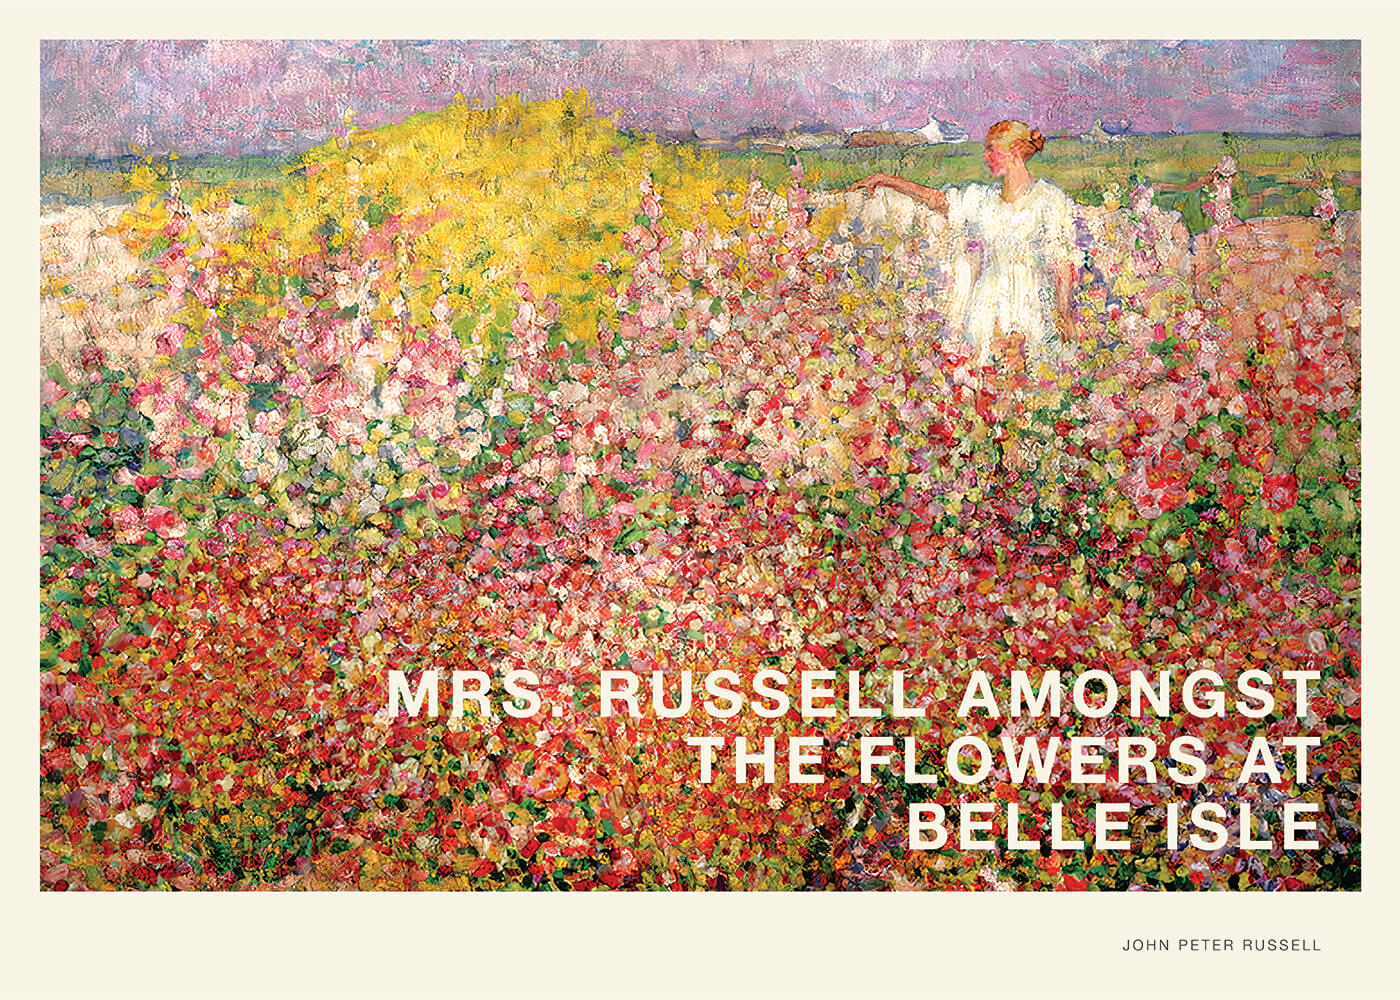 Billede af Mrs. Russell amongst the flowers at Belle Isle - John Peter Russell kunstplakat